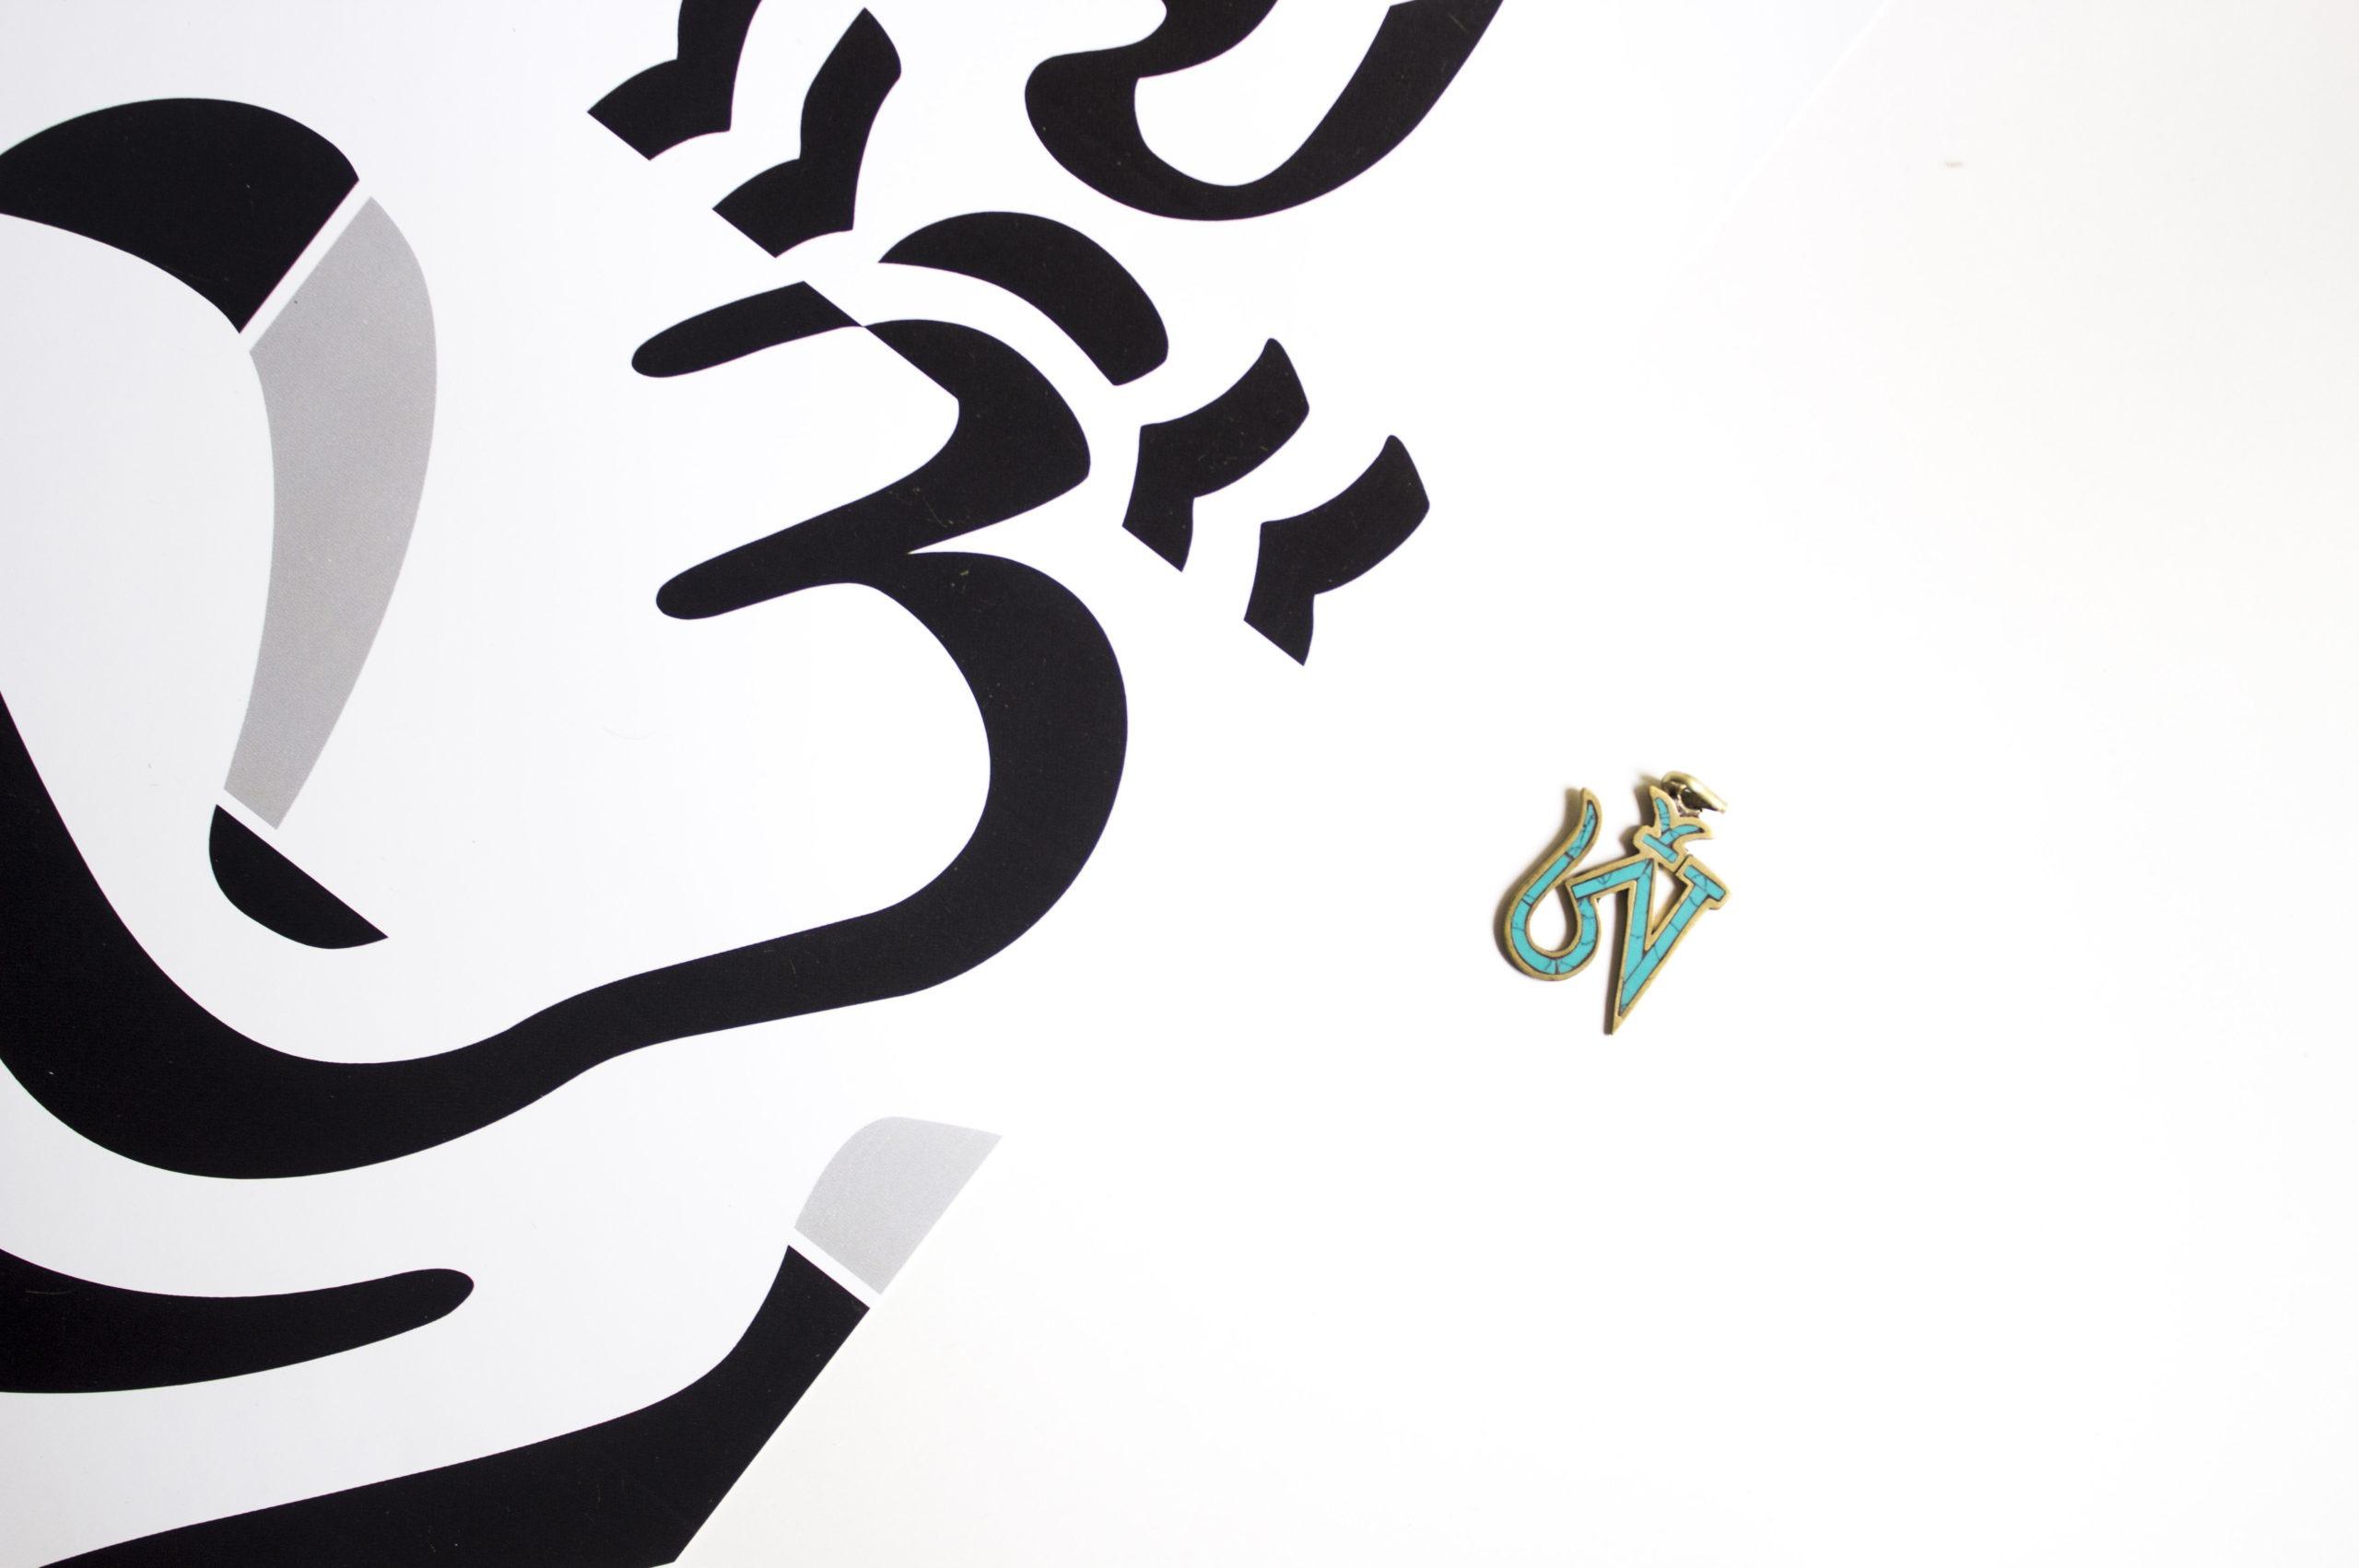 Tibetan Typography